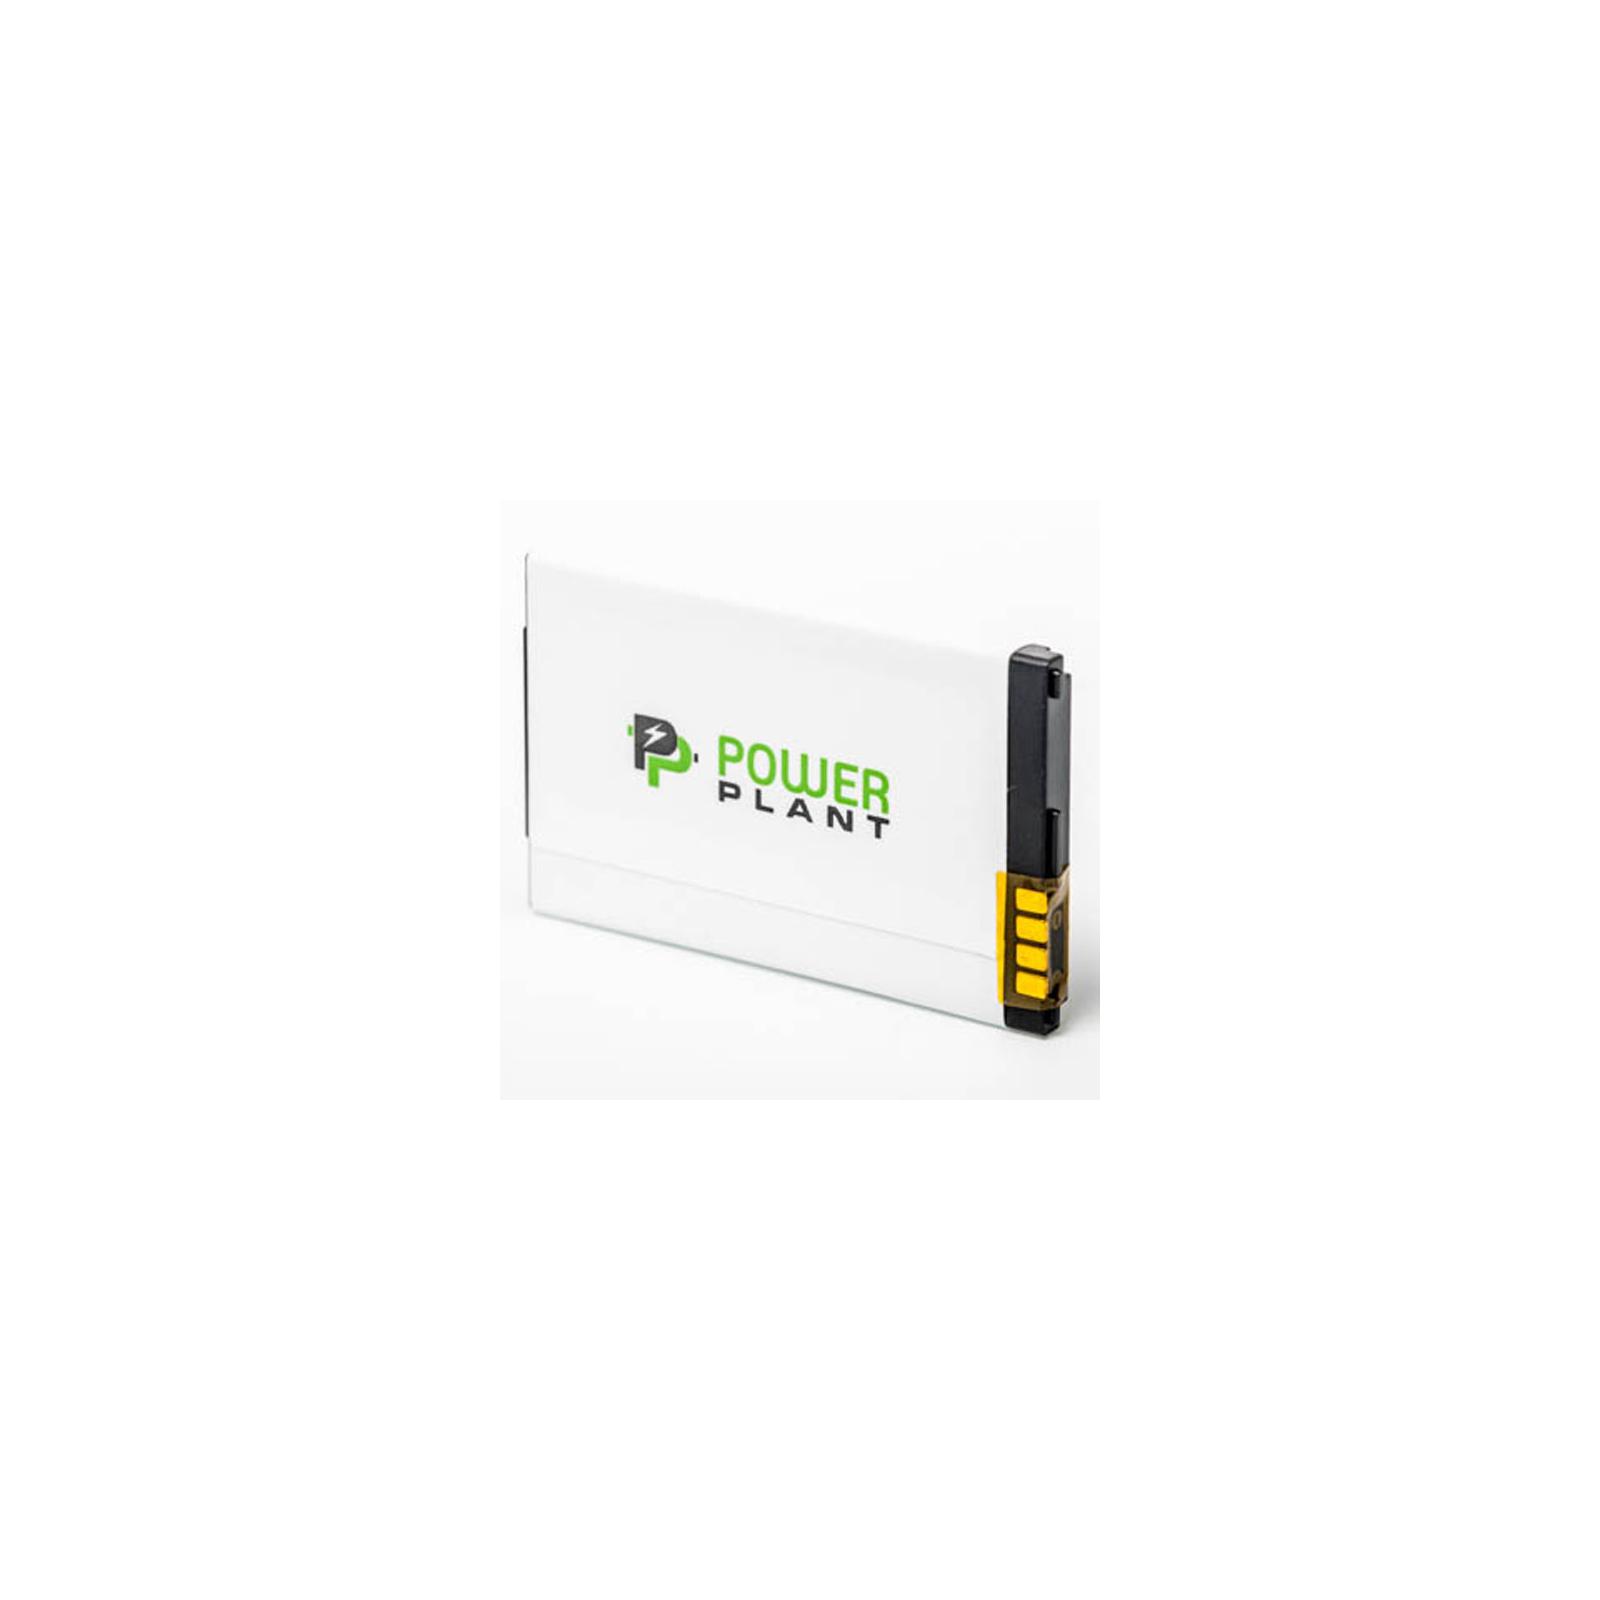 Аккумуляторная батарея PowerPlant LG KG77 (KG77/KE770/KM380/KG375/MG160/KF510) (DV00DV6165) изображение 2